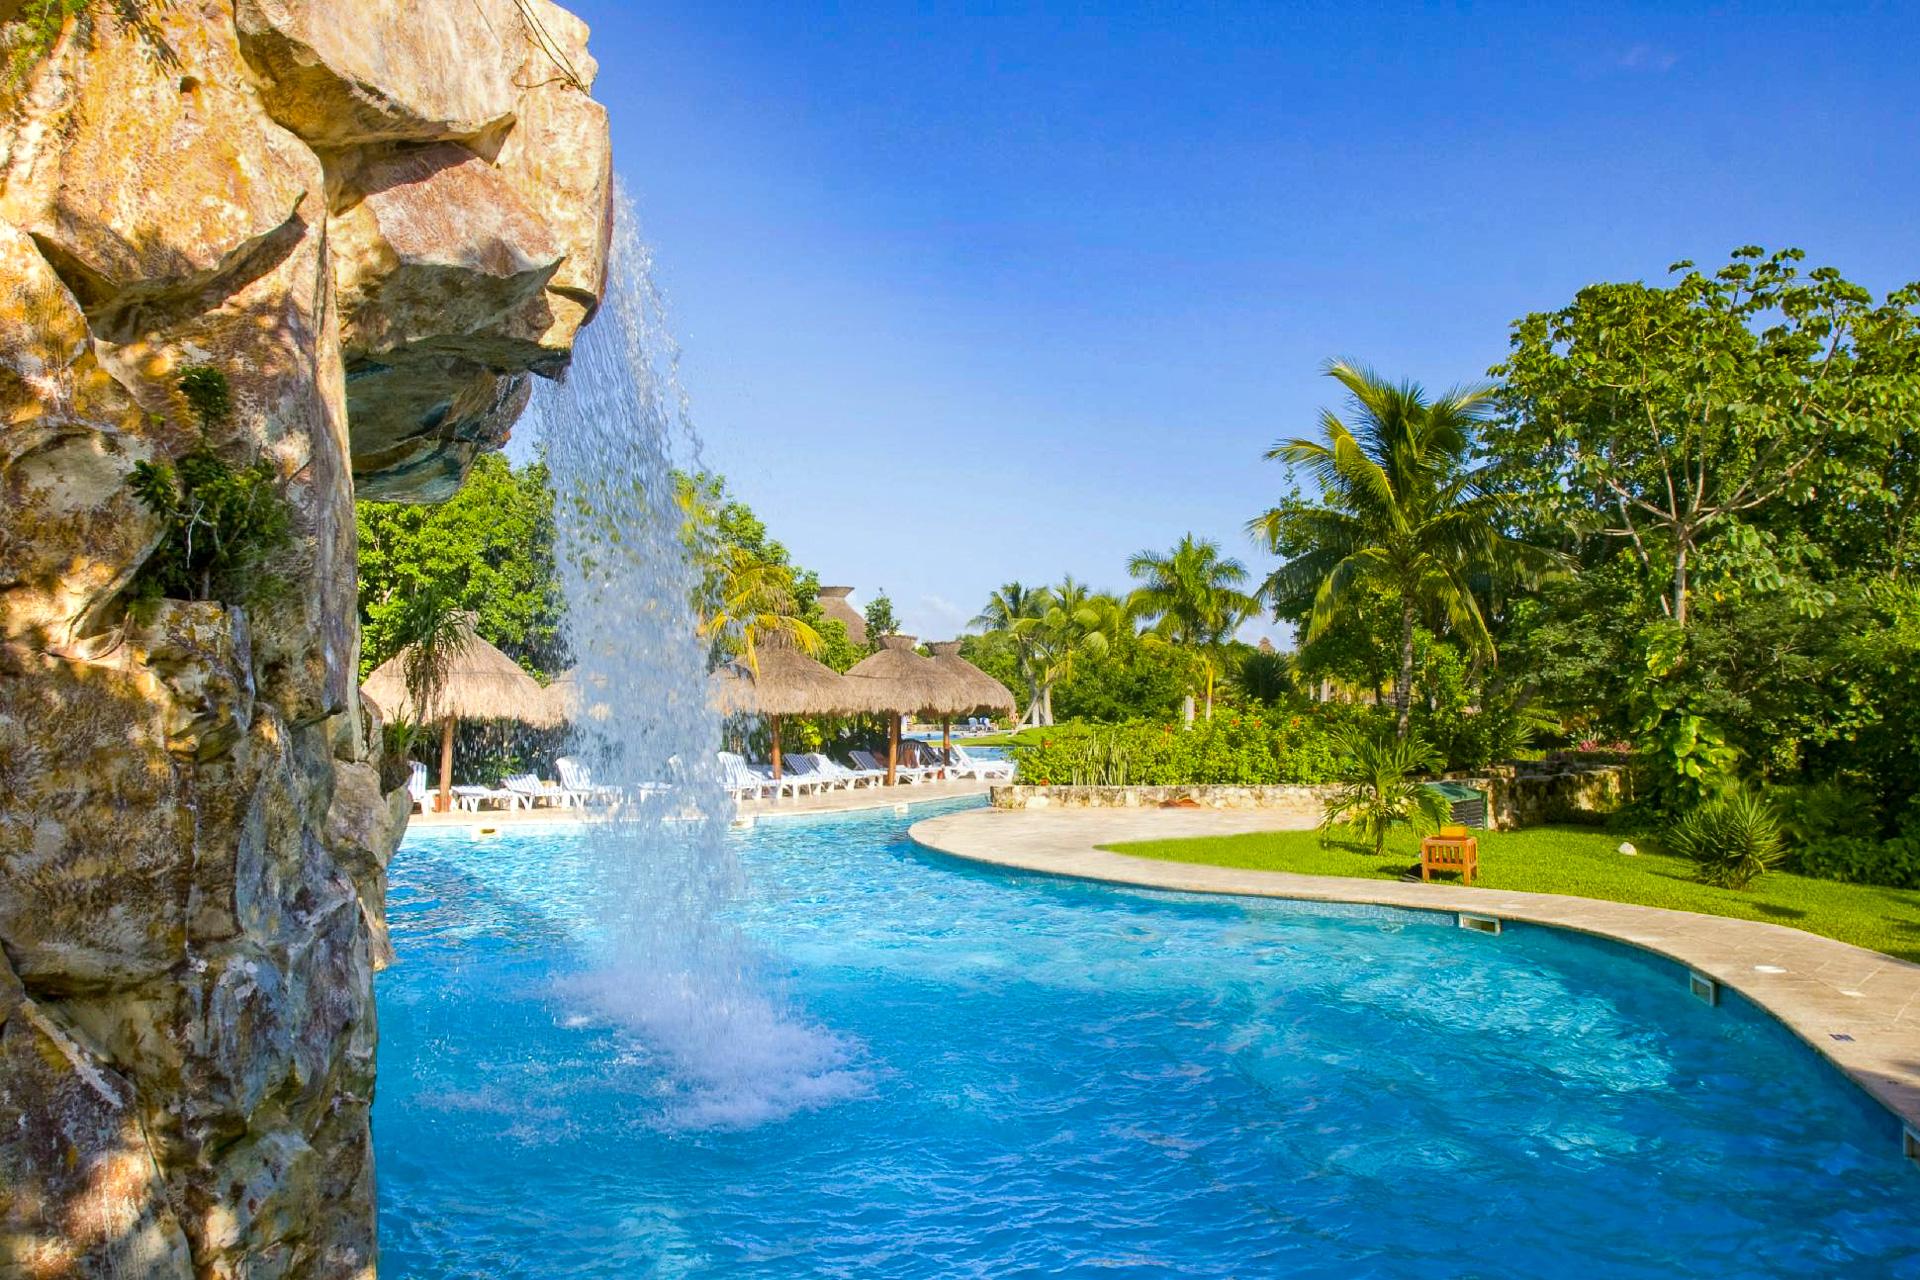 Pool fountain at Iberostar Paraiso Beach; Courtesy of IBEROSTAR Paraiso Beach